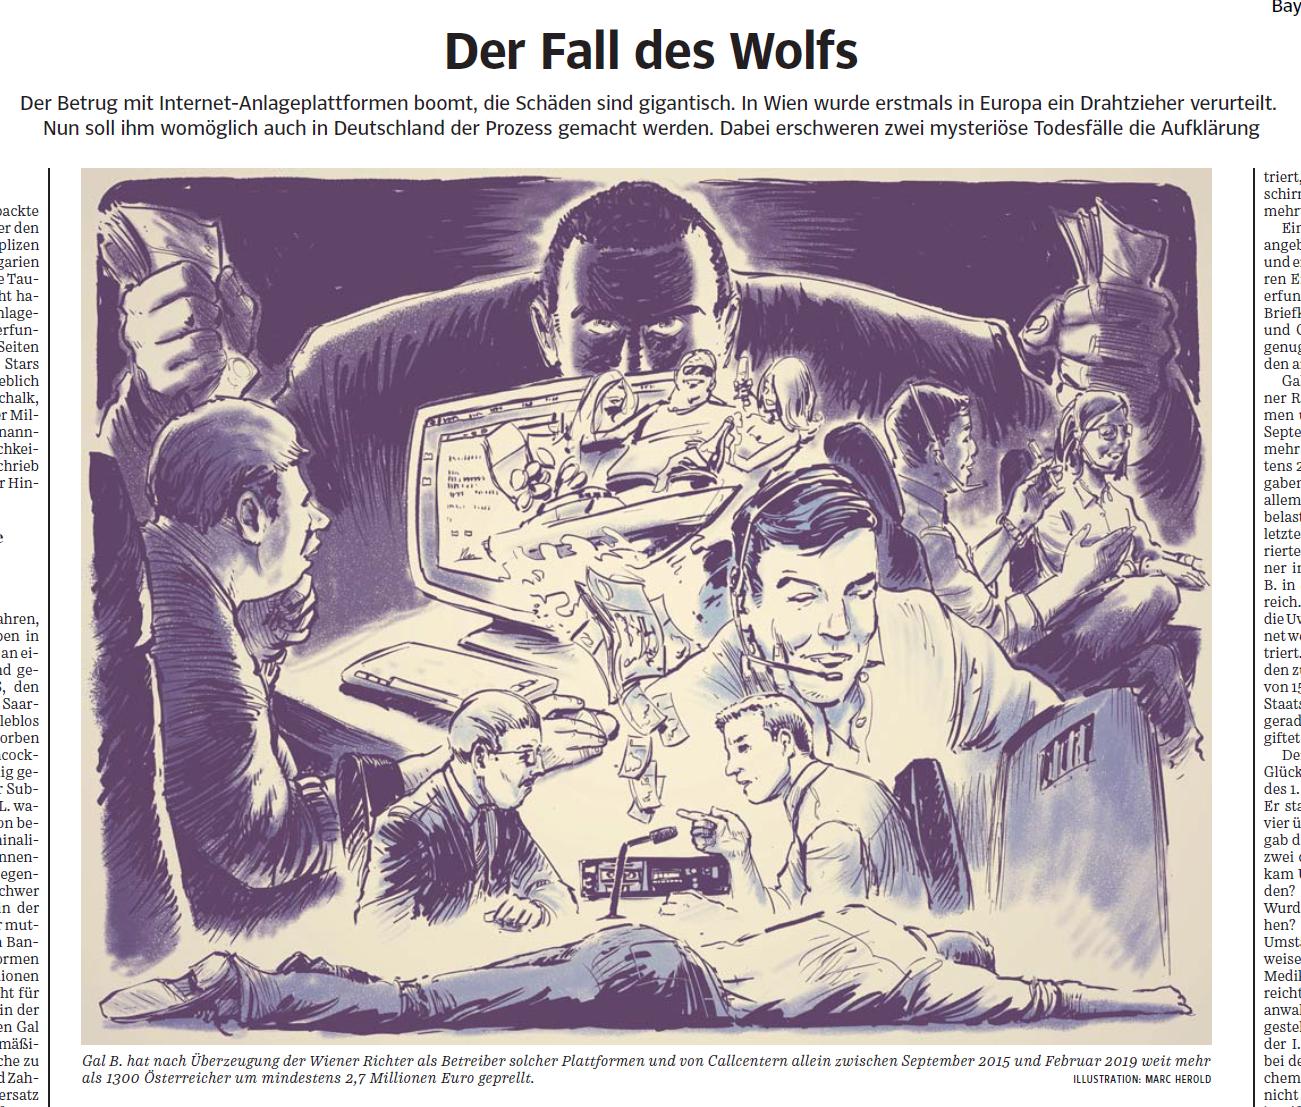 SZ Der Fall des Wolfes Gal Barak